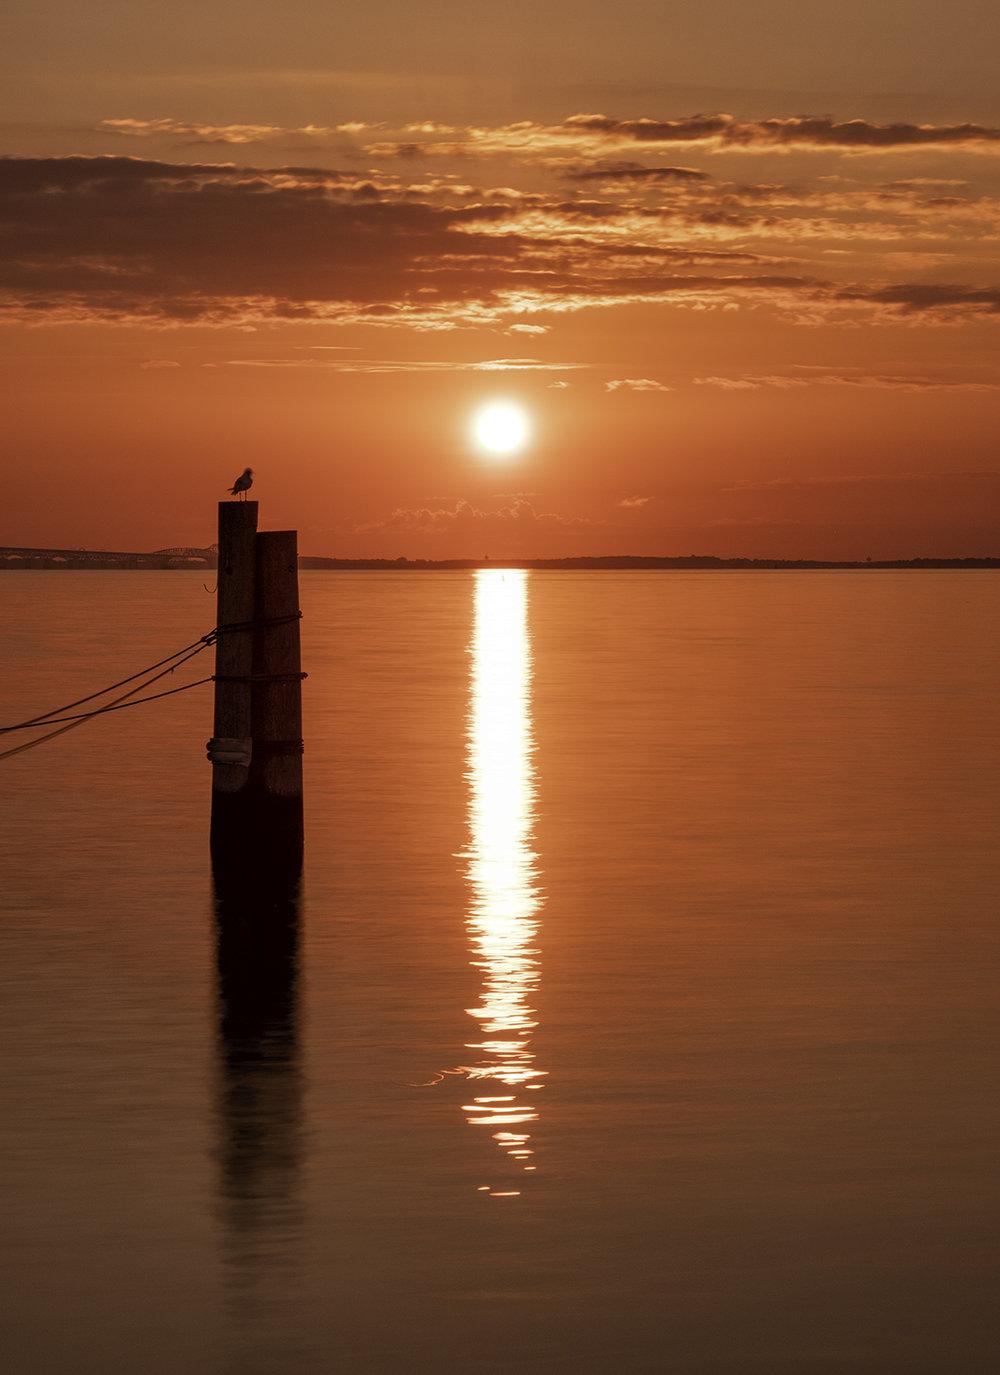 180903 Annapolis Sunrise 74-1 16x22.jpg